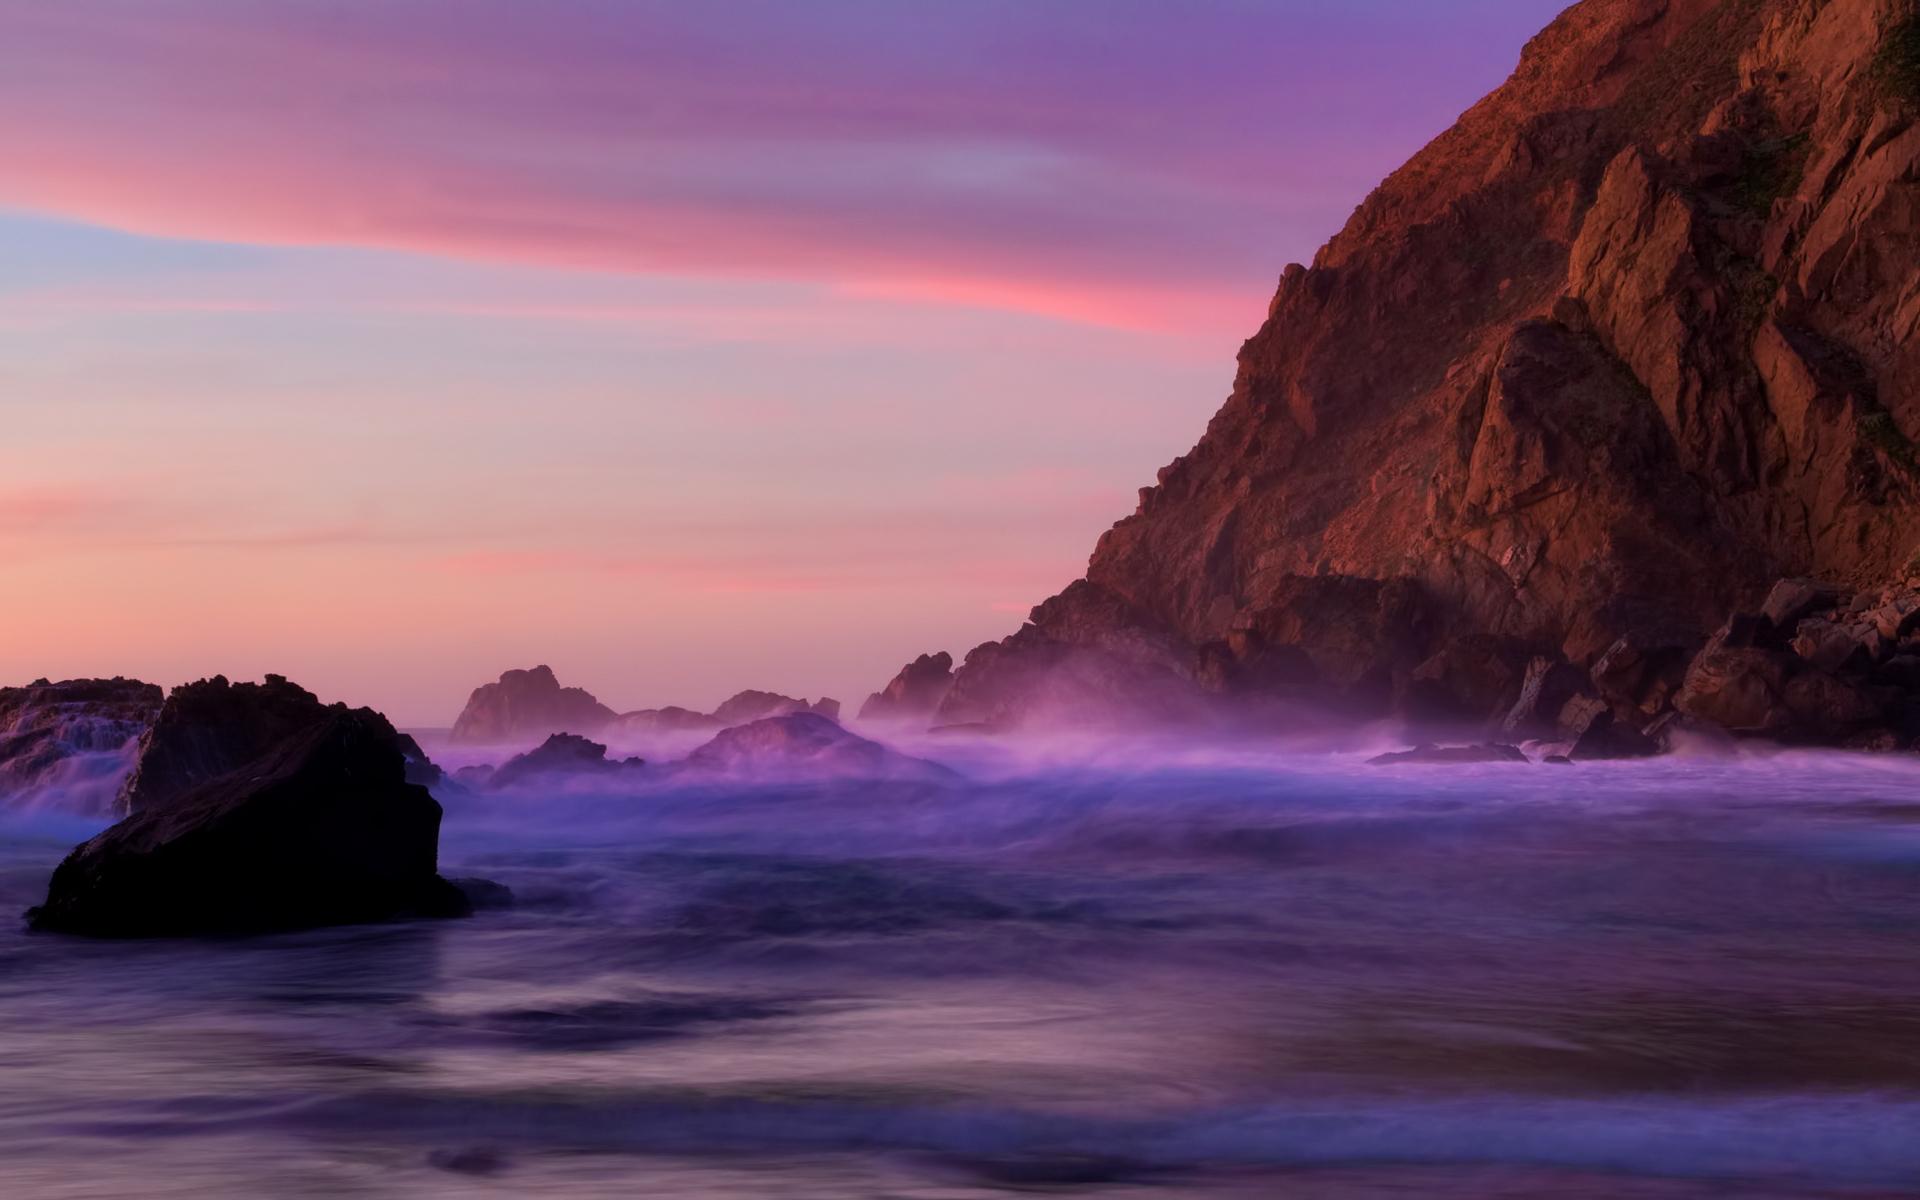 sunset wallpapers purple nice